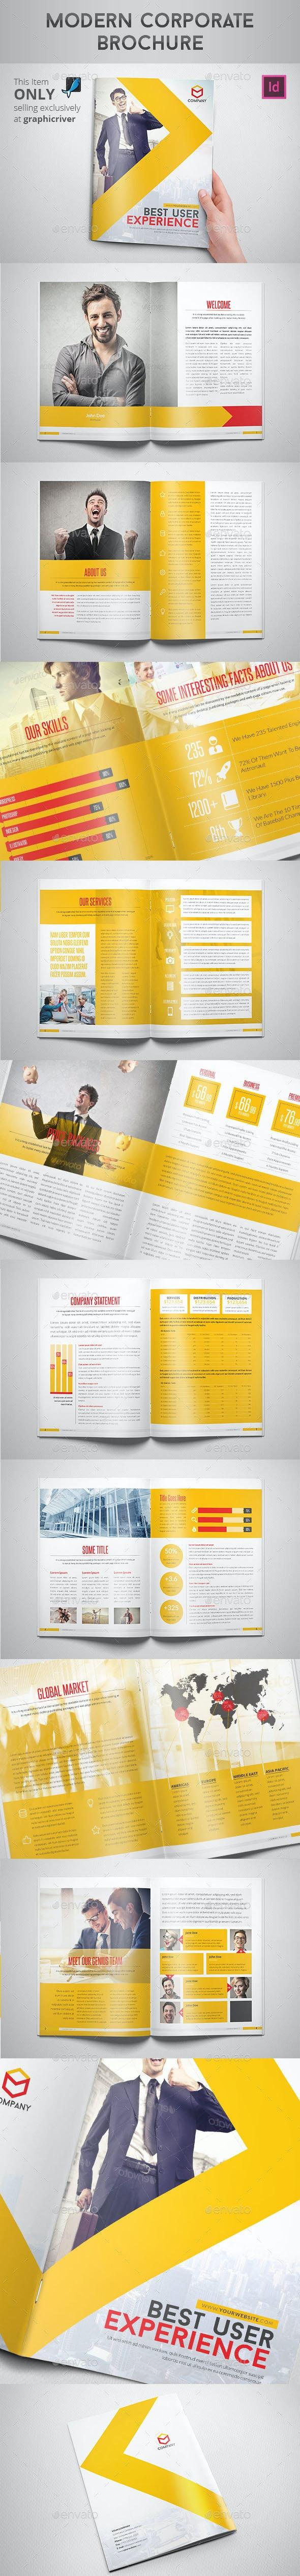 Modern Corporate Brochure - Corporate Brochures